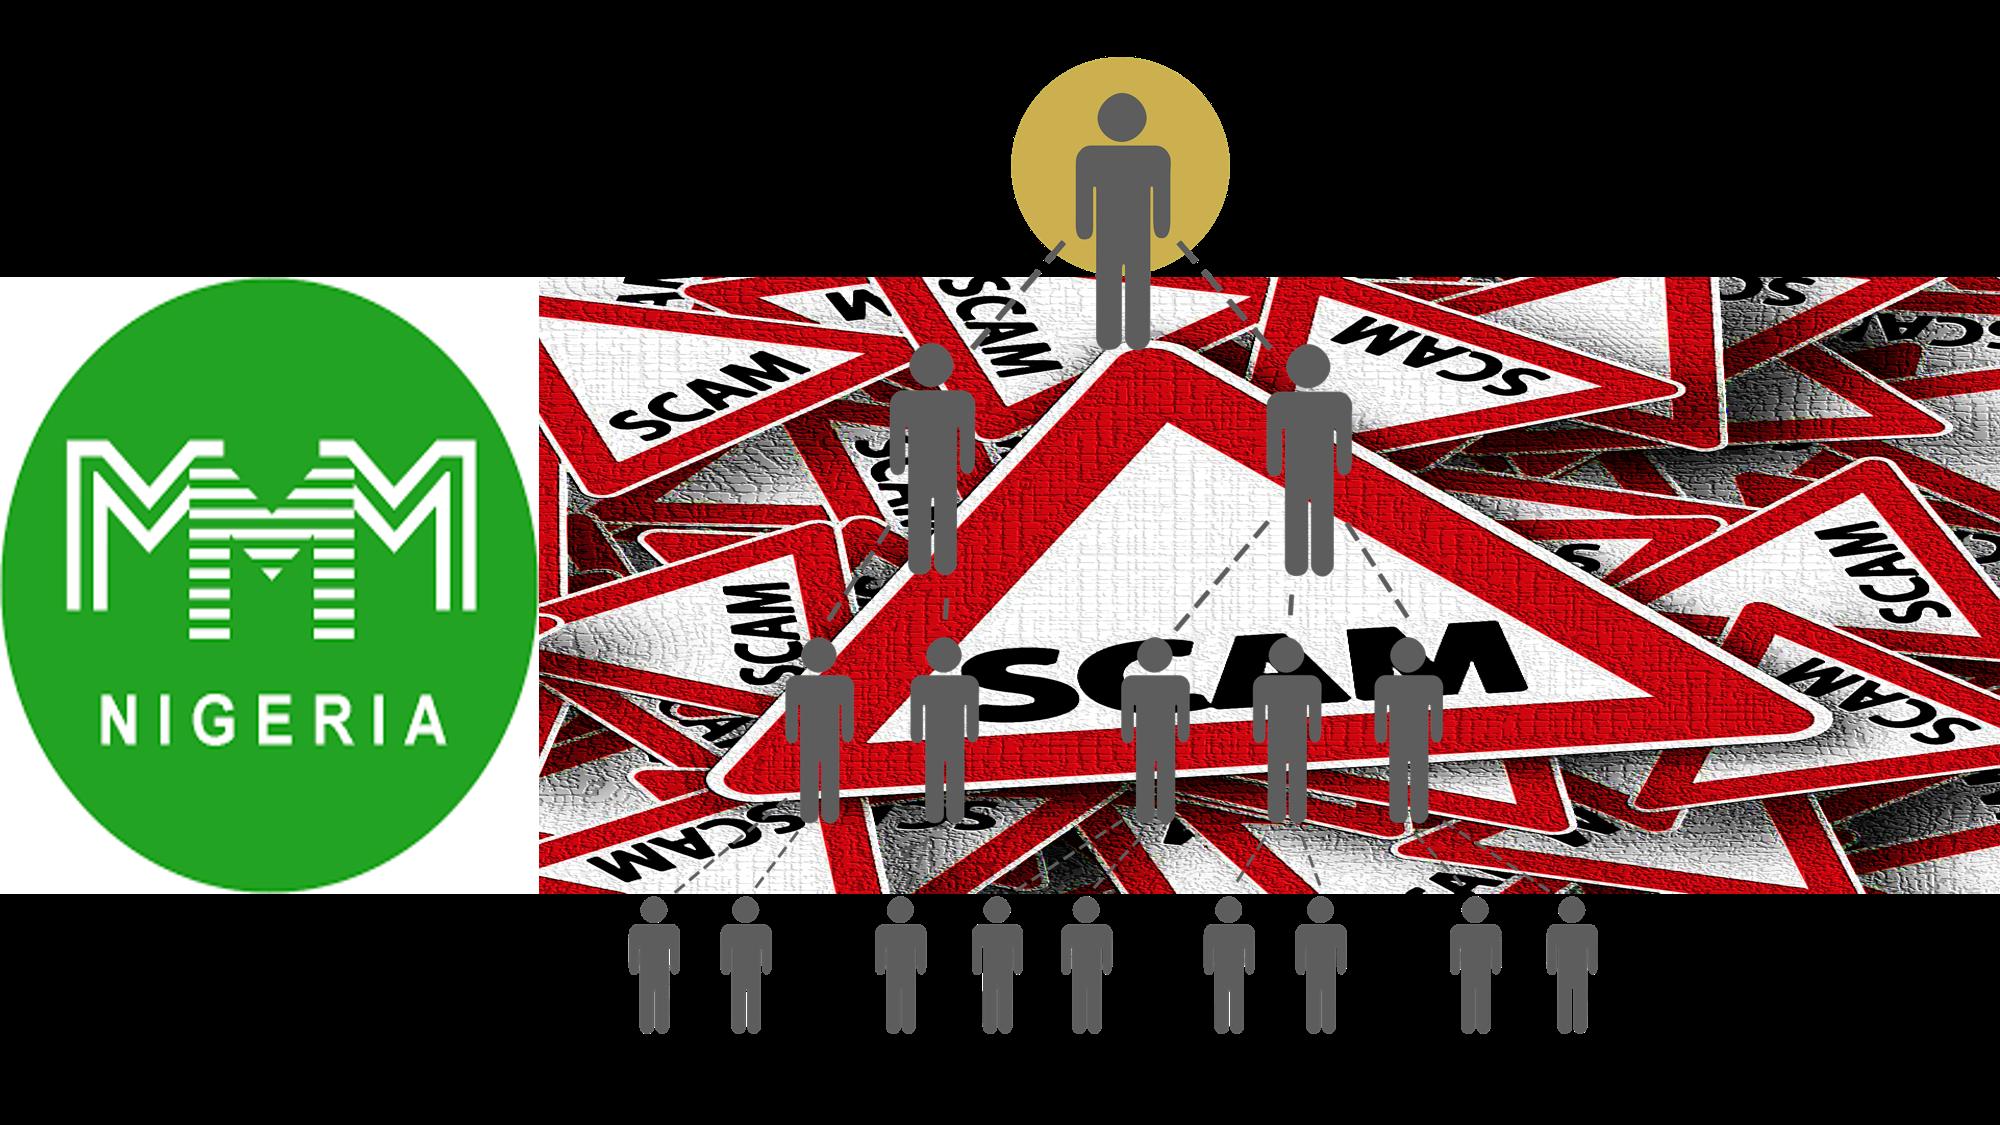 MMM Nigeria Ponzi Scheme